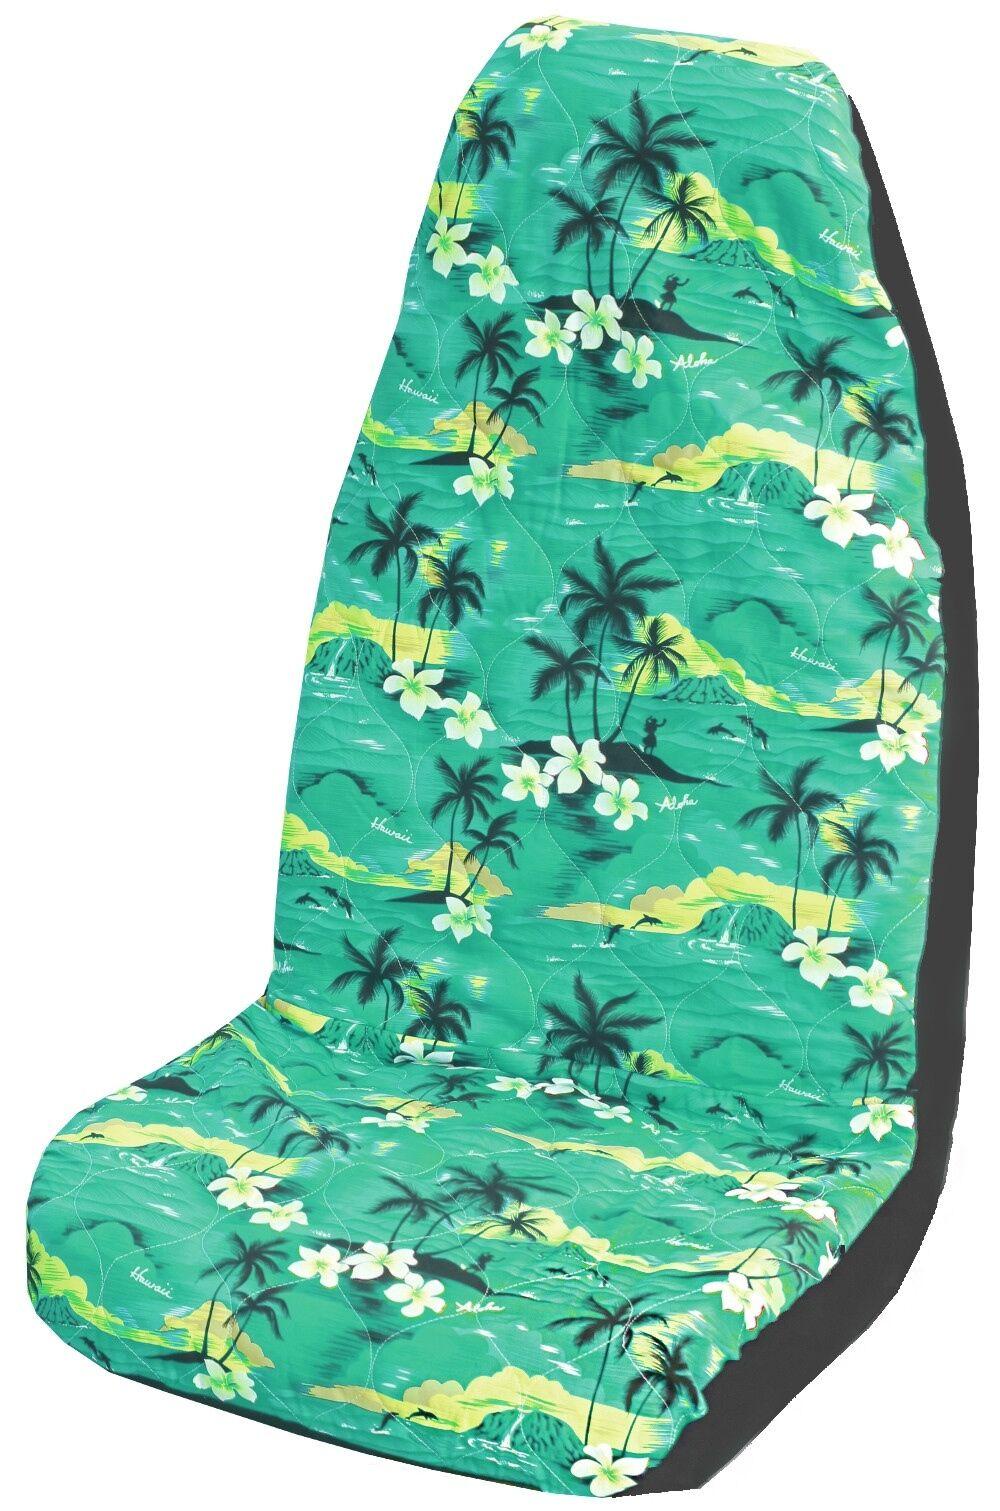 100 Sunsets  Hawaiian Car Seat Covers - Set of 2